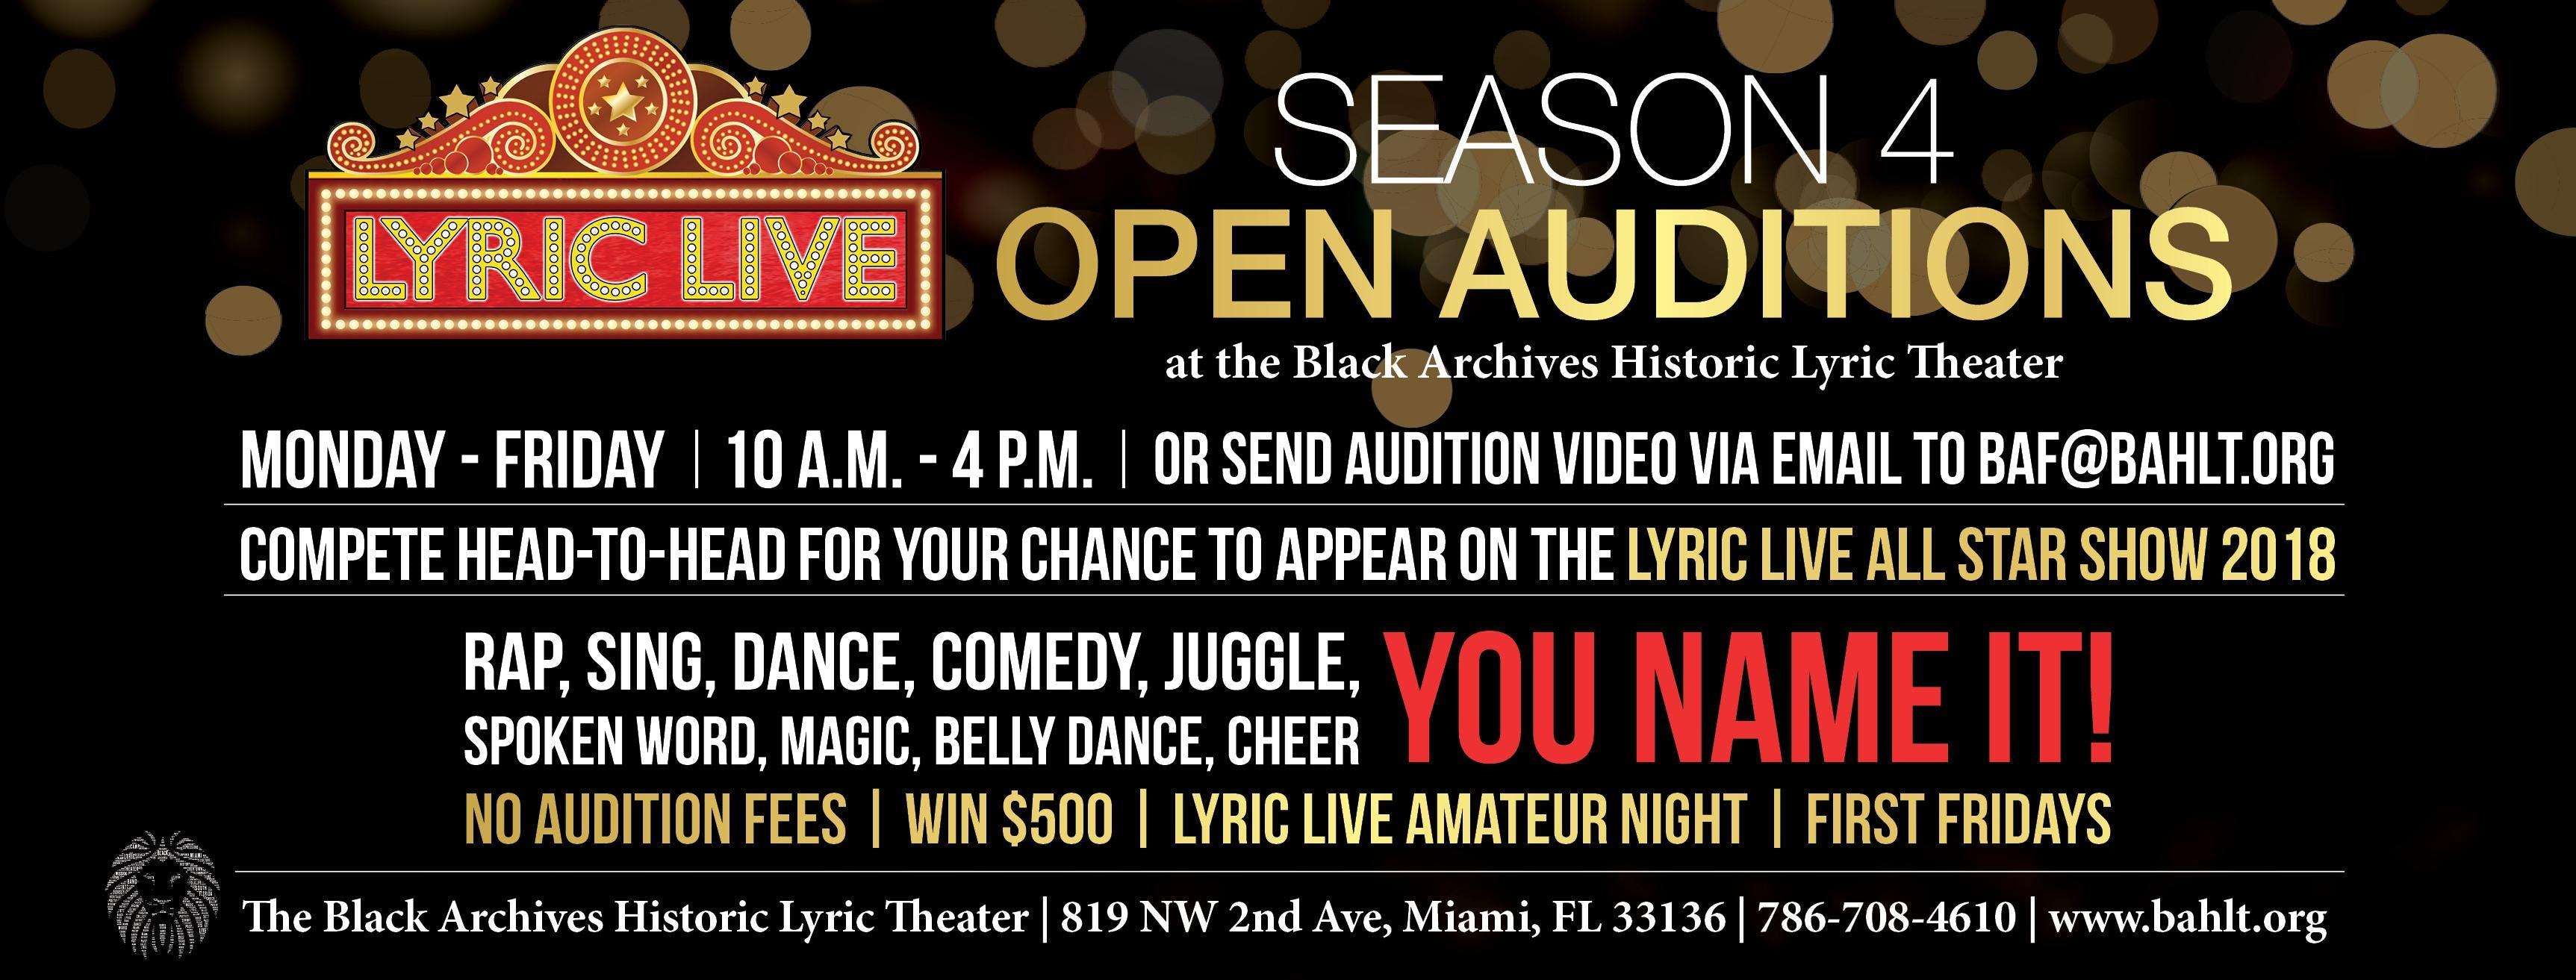 Lyric Live @ The Black Archives Historic Lyric Theater